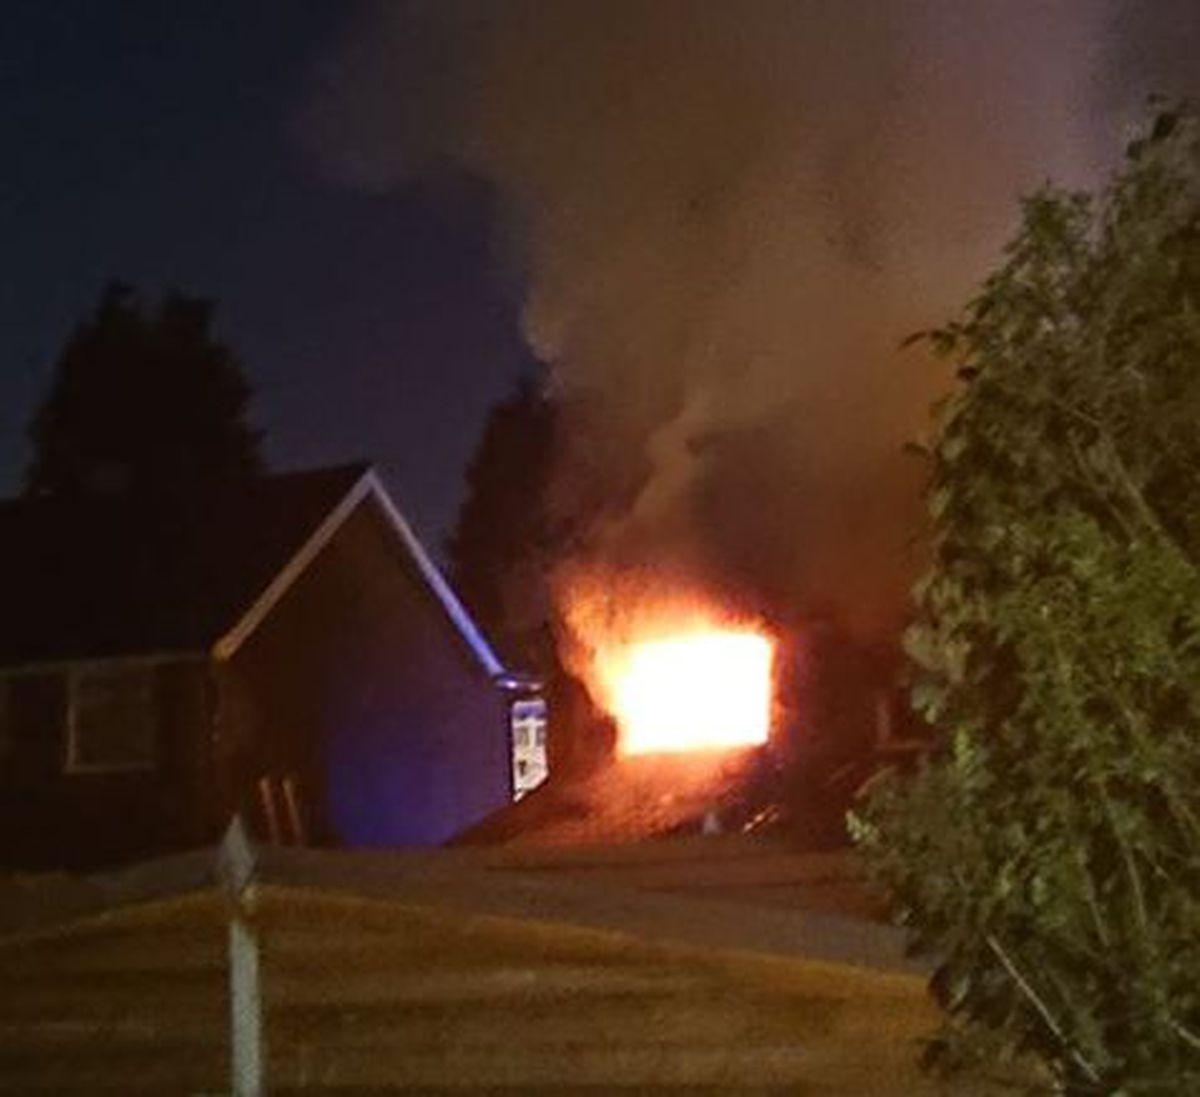 The fire in Deans Road. Photo: Karolina Domanska